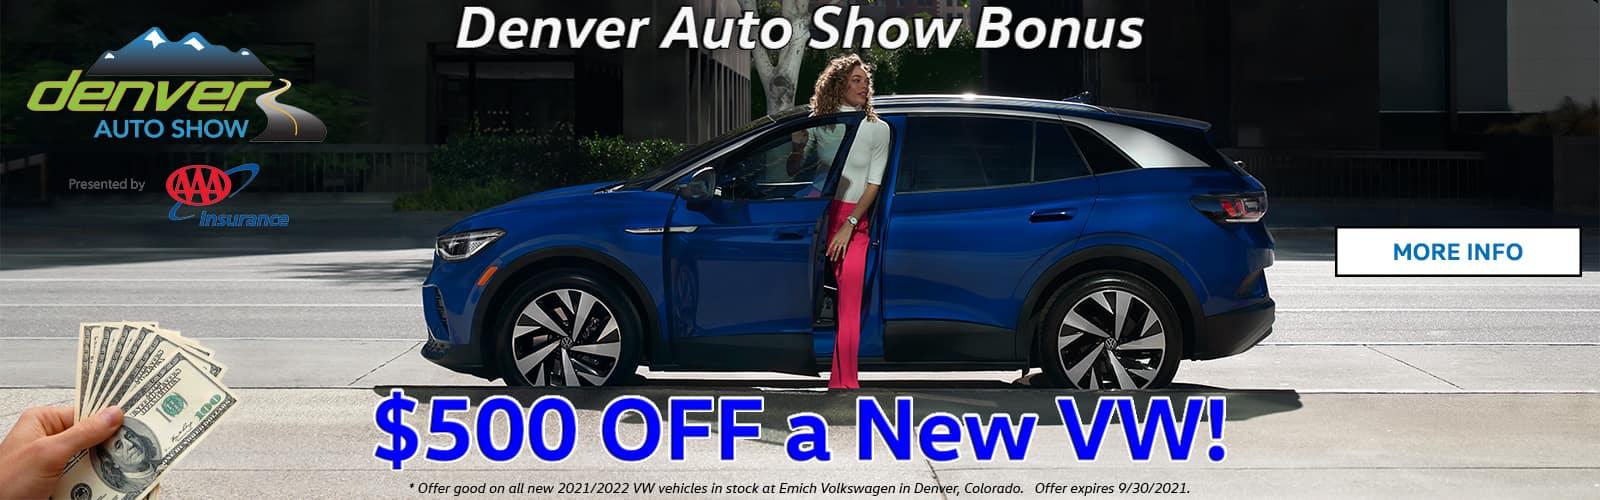 $500 Bonus on VW for 2021 Denver Auto Show